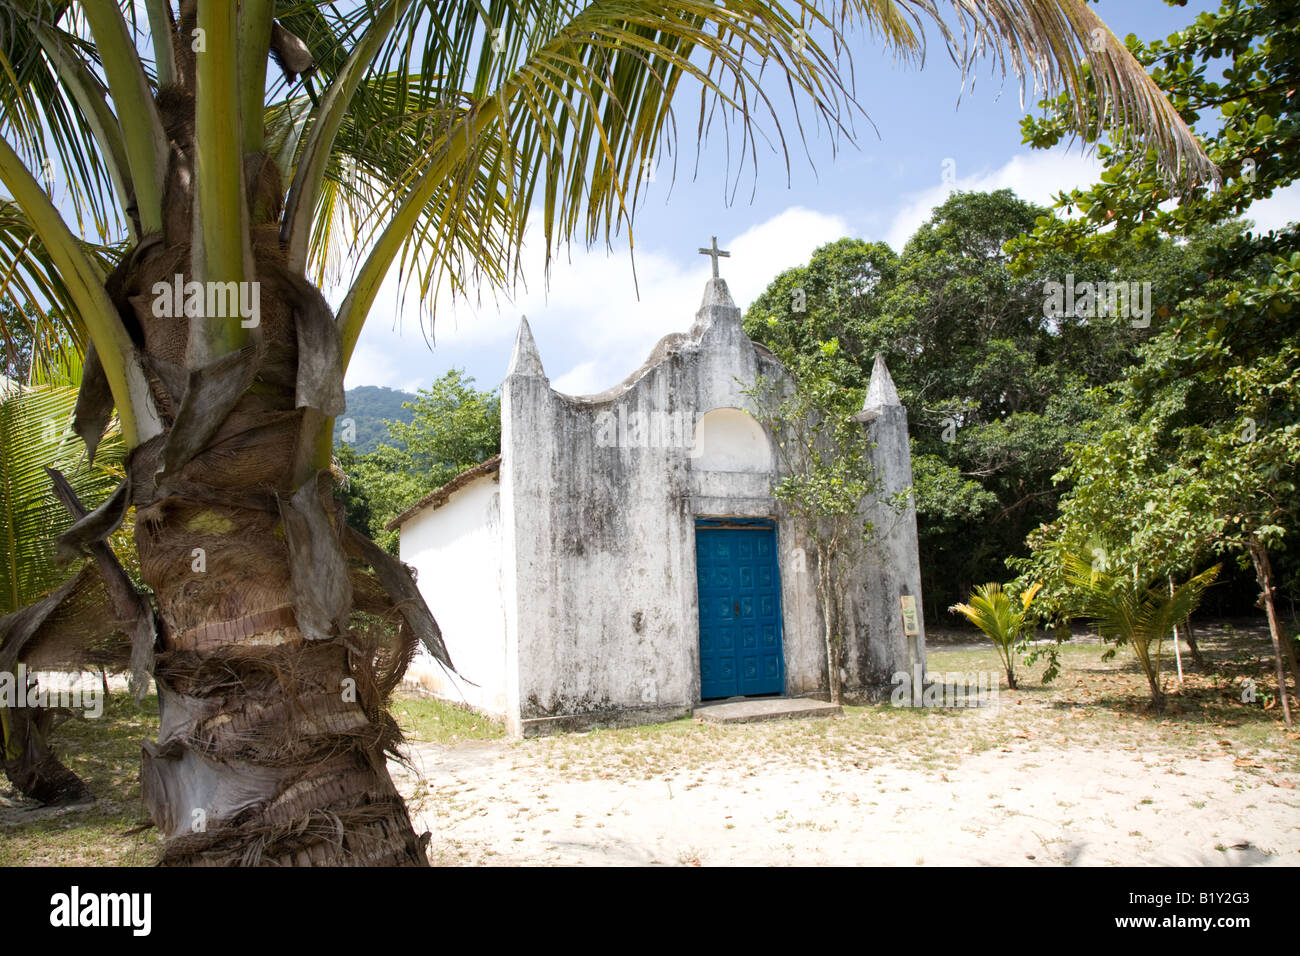 Piccola chiesa, Lopes Mendes Beach, Ilha Grande, Brasile Immagini Stock